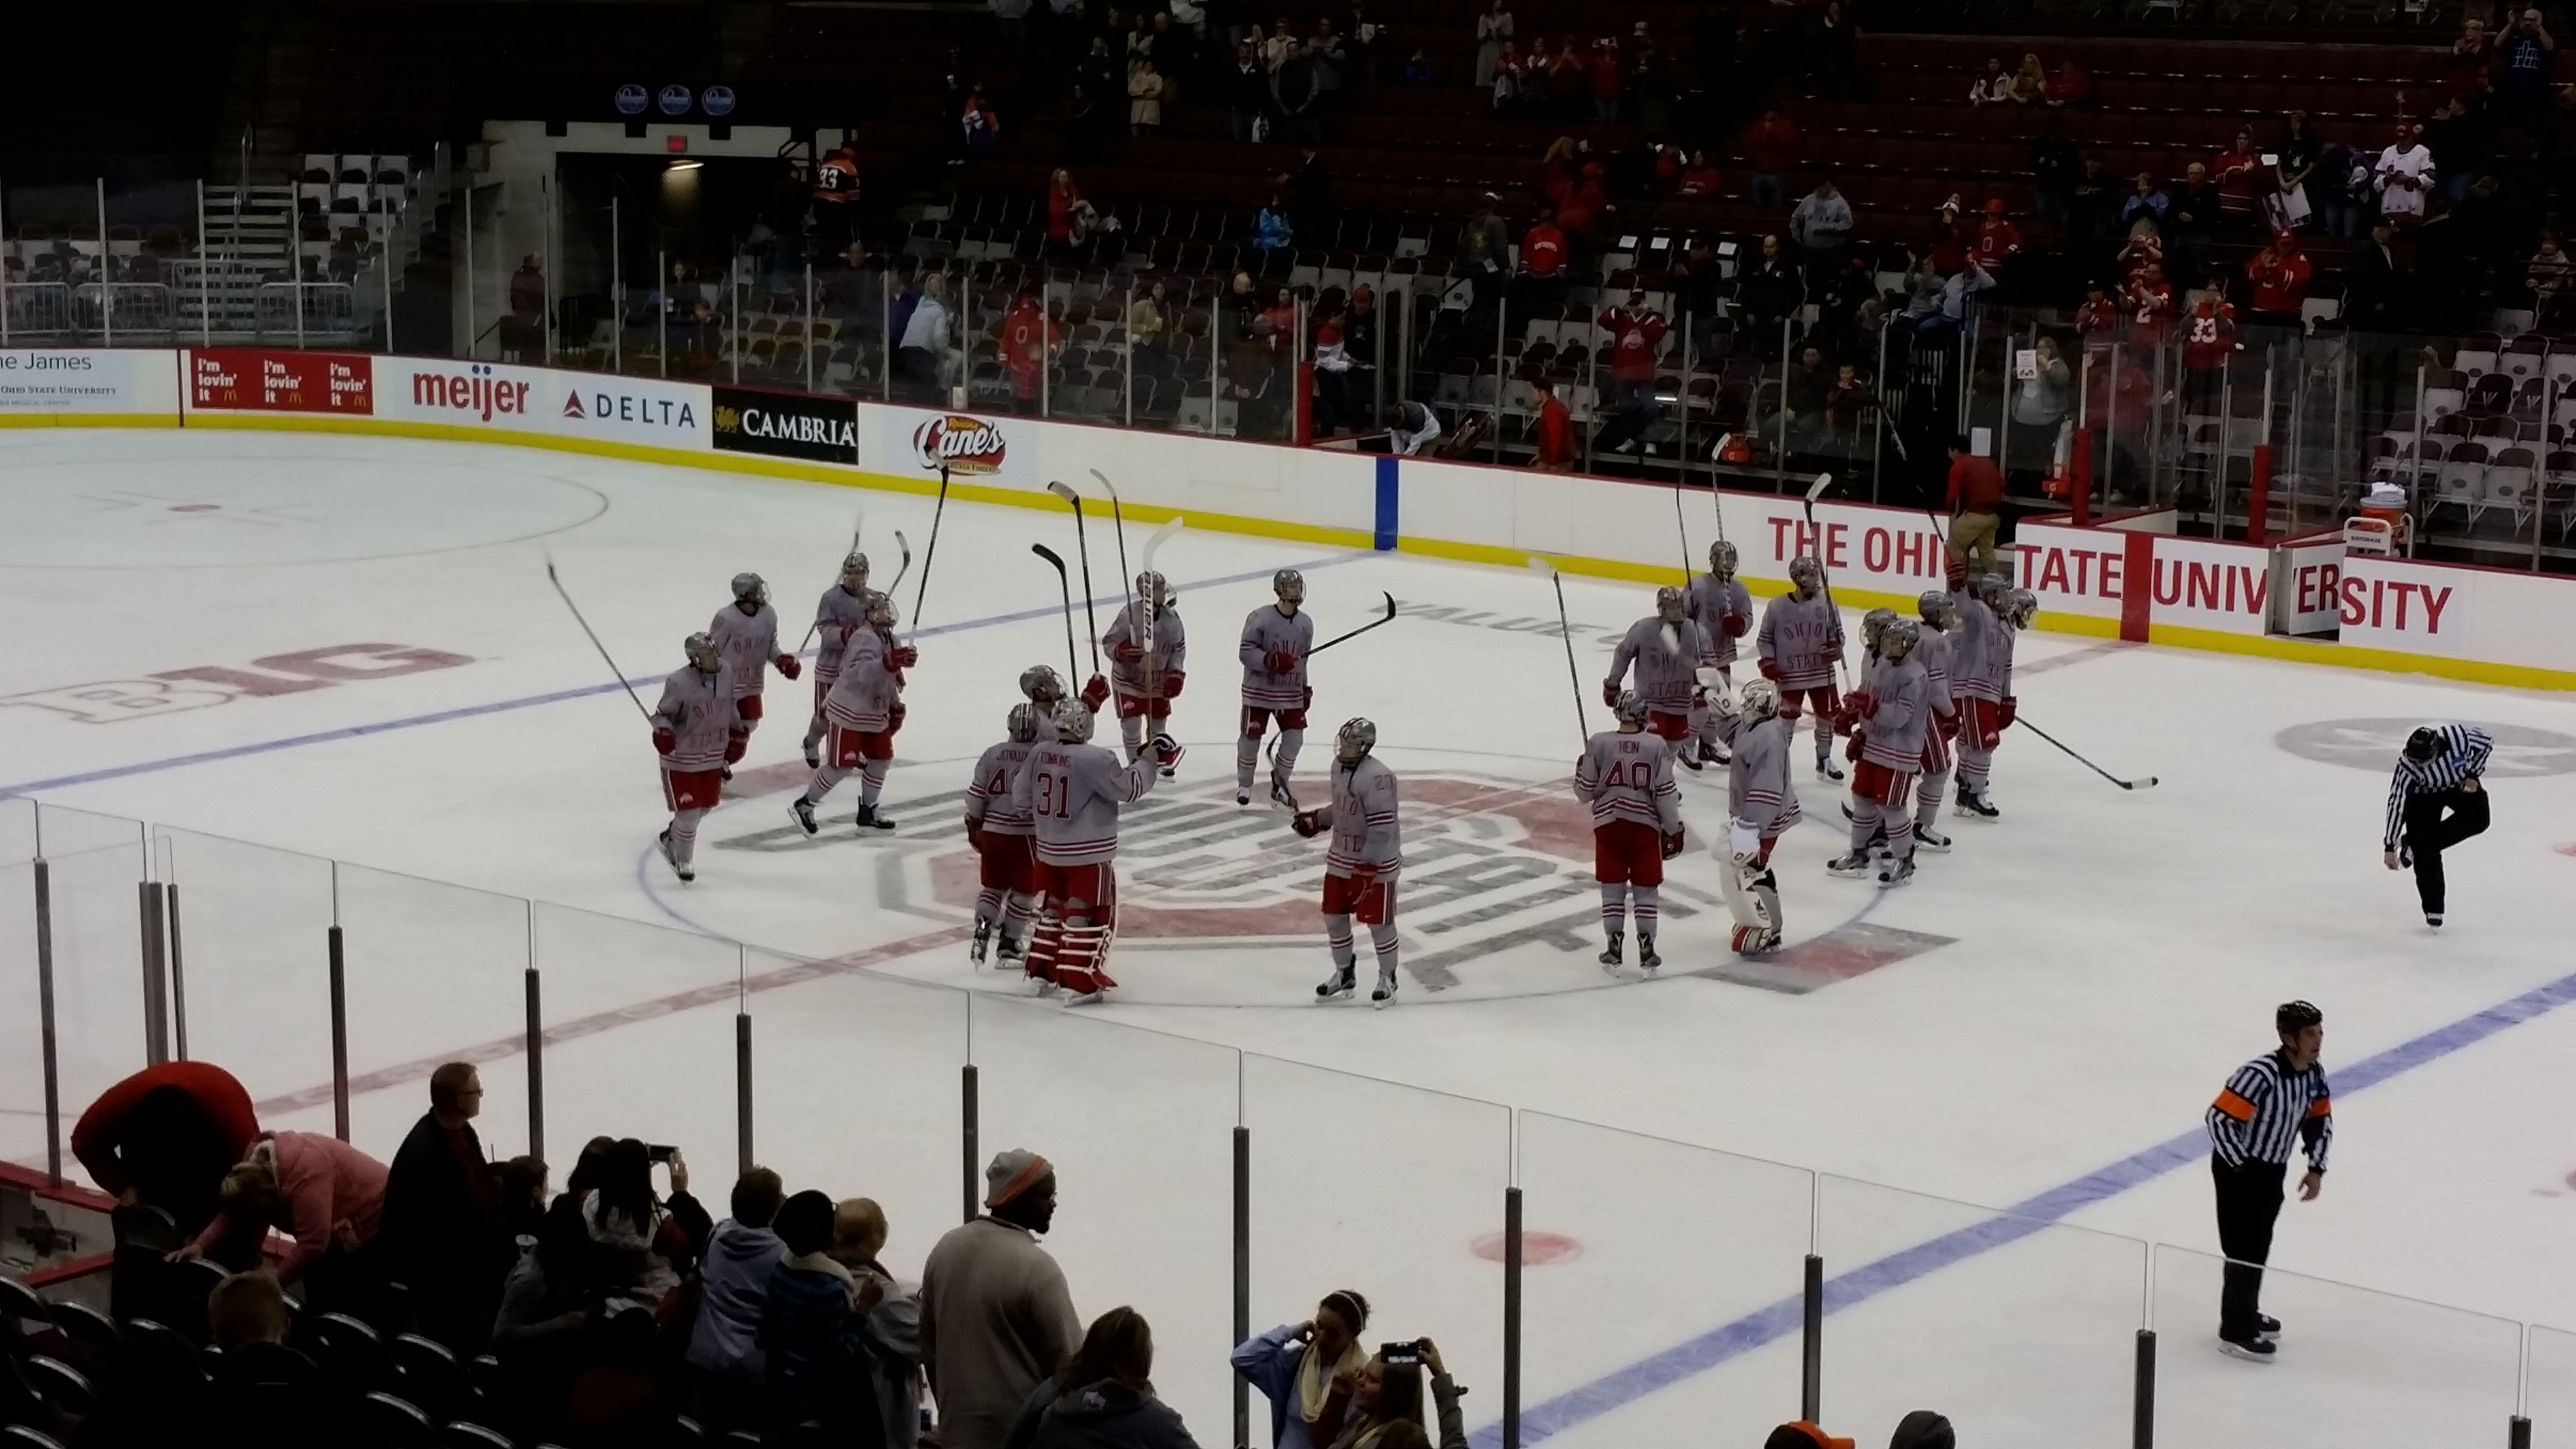 Preview: Ohio State vs Michigan Men's Hockey February 24-25